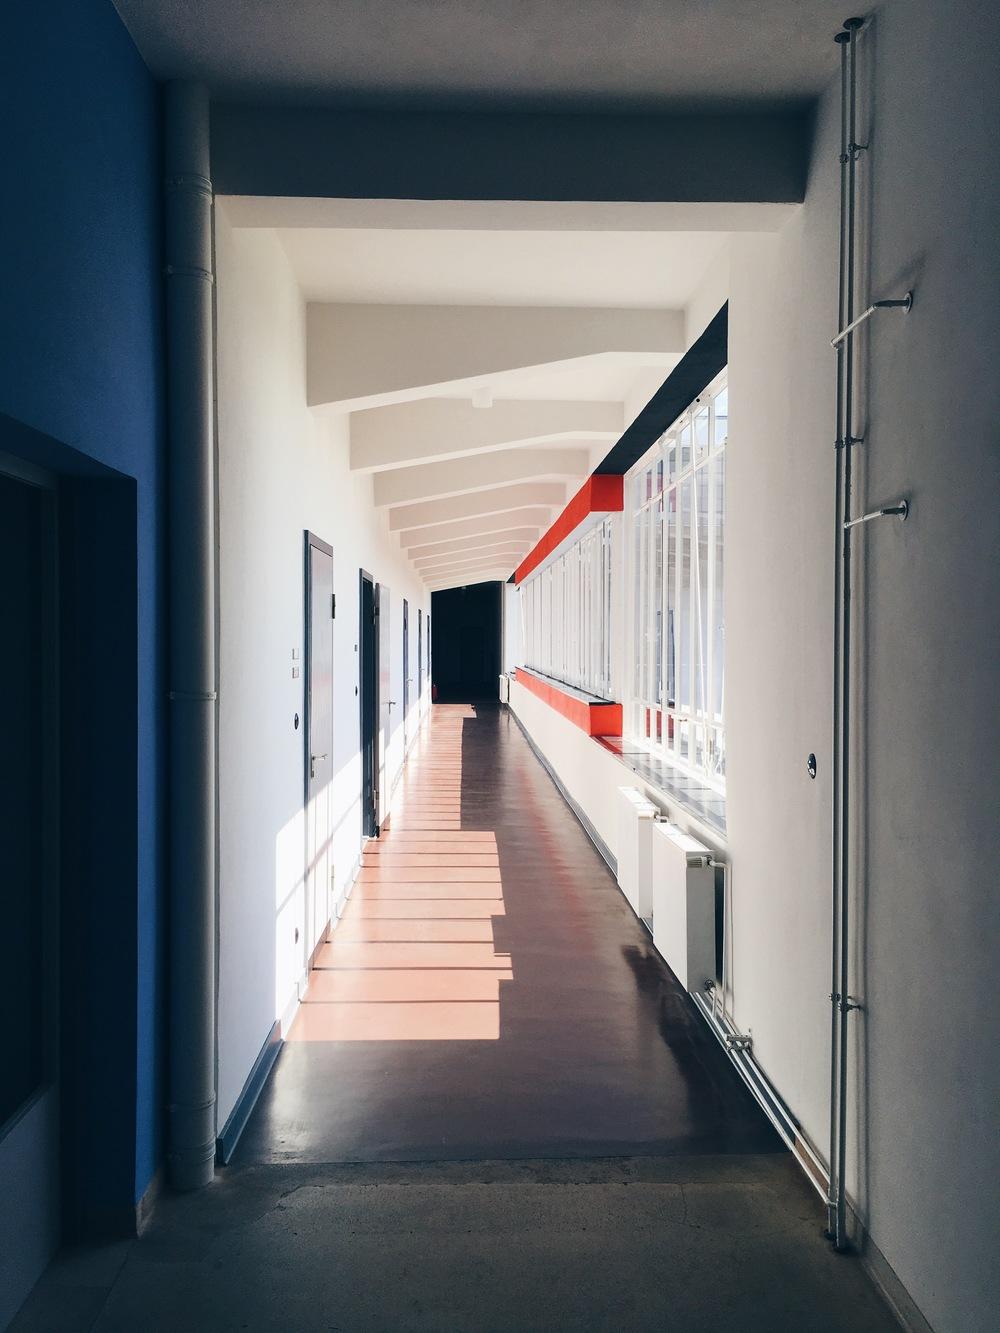 Korridor iBauhausskolan, sommaren 2016.